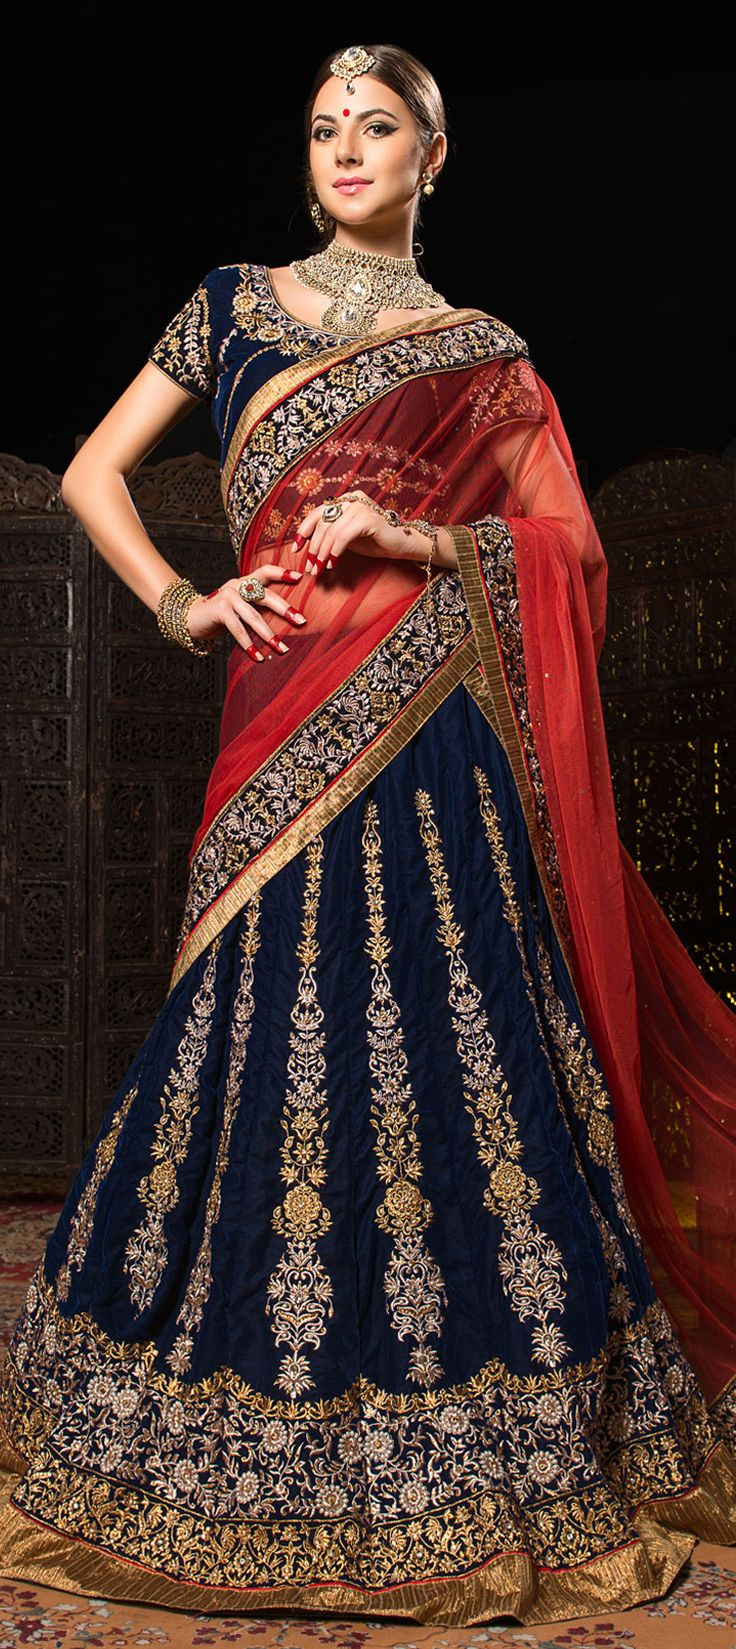 153202: WEDDING LEHENGA - check out this new style of embroidered #lehenga for wedding parties.   #Bridalwear #IndianFashion